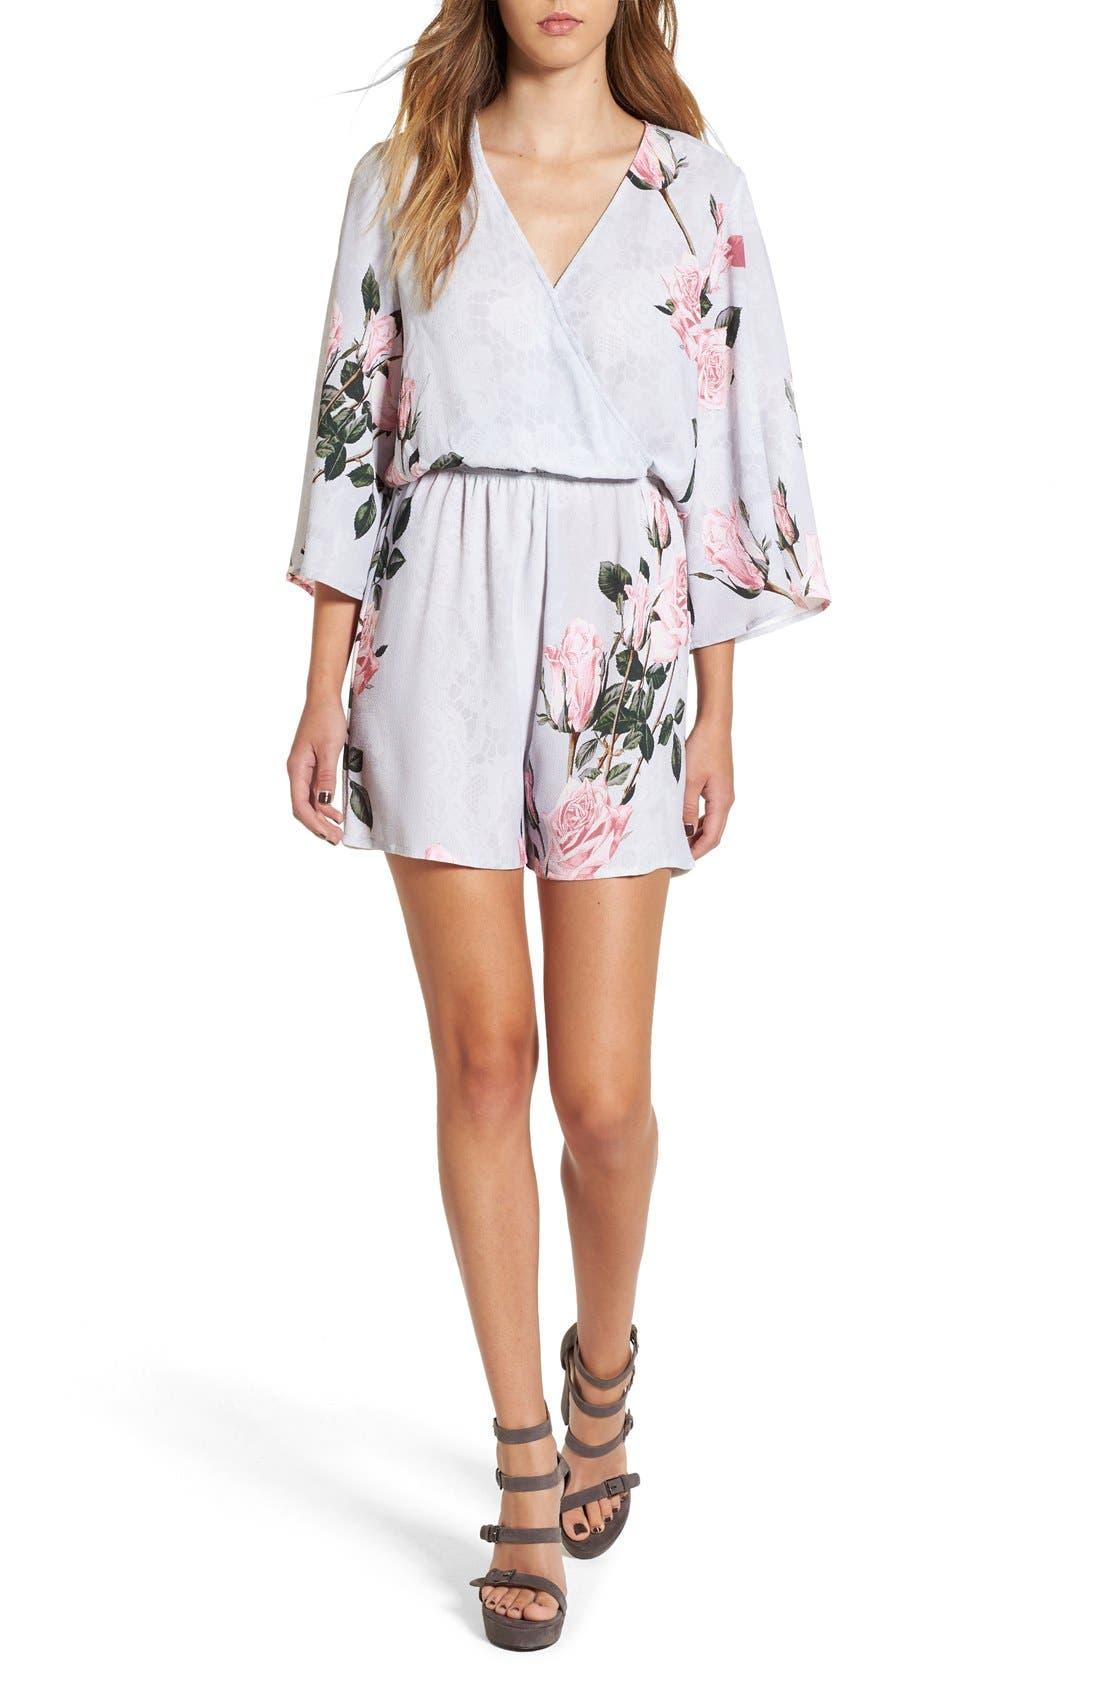 Alternate Image 1 Selected - Glamorous Floral Print Lace Kimono Romper